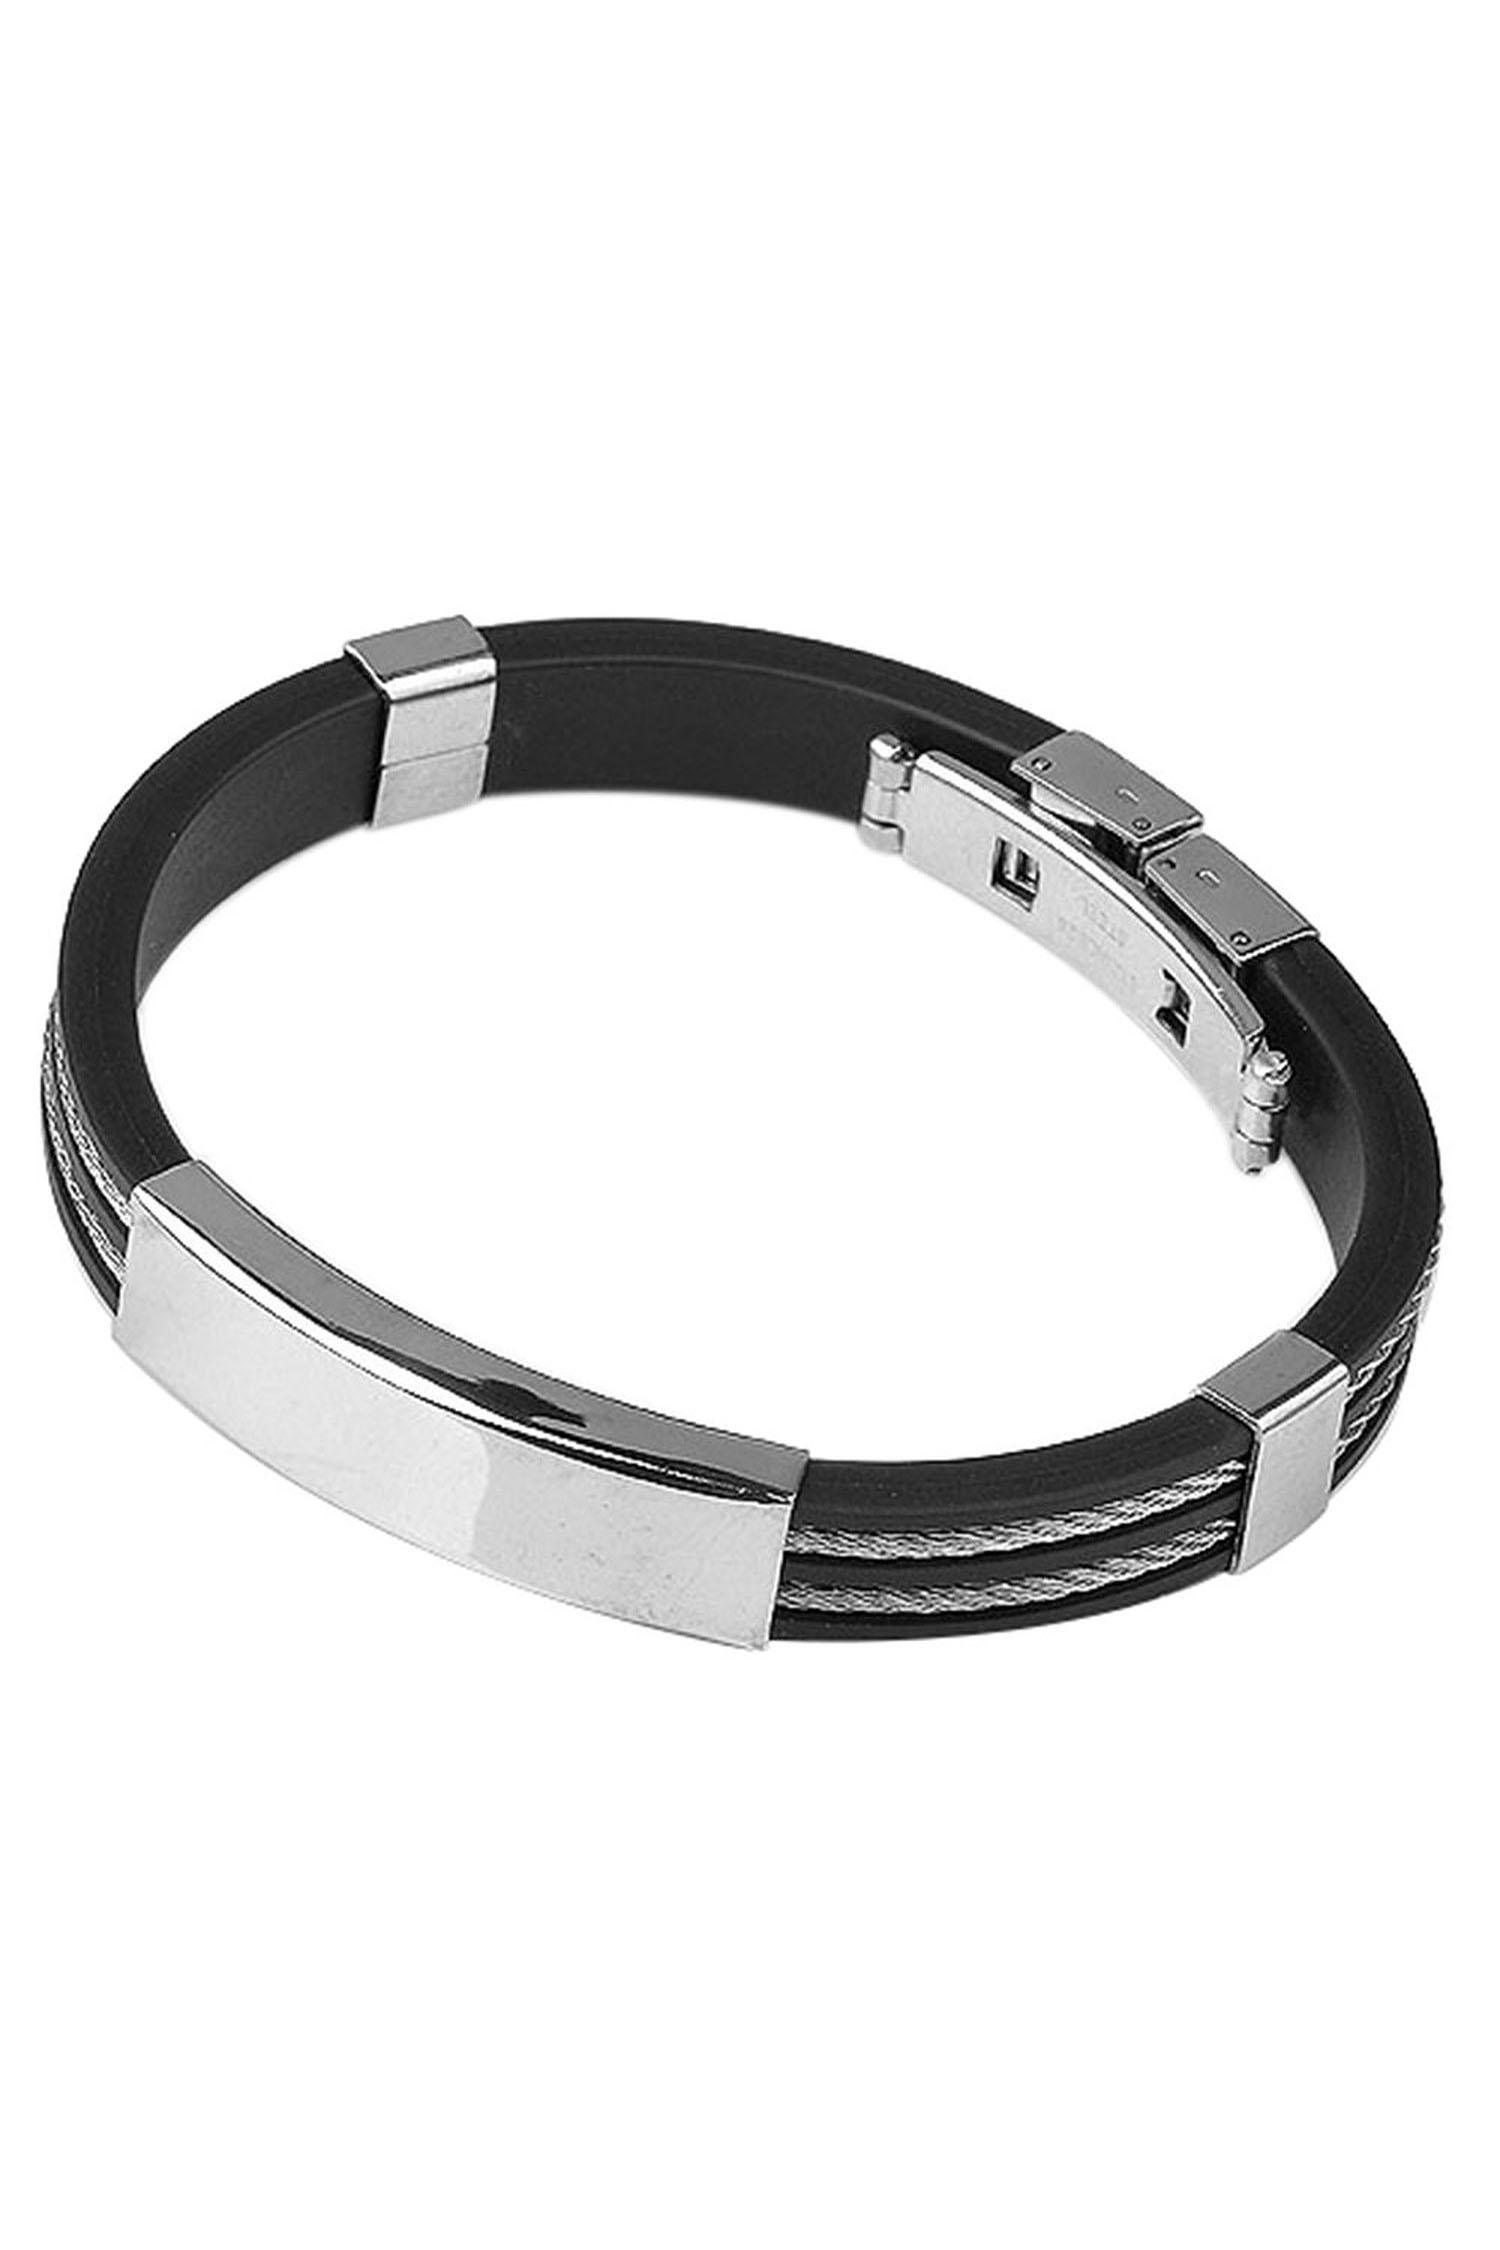 sodial r herren gummi edelstahl armband armreif schmucksache gy. Black Bedroom Furniture Sets. Home Design Ideas